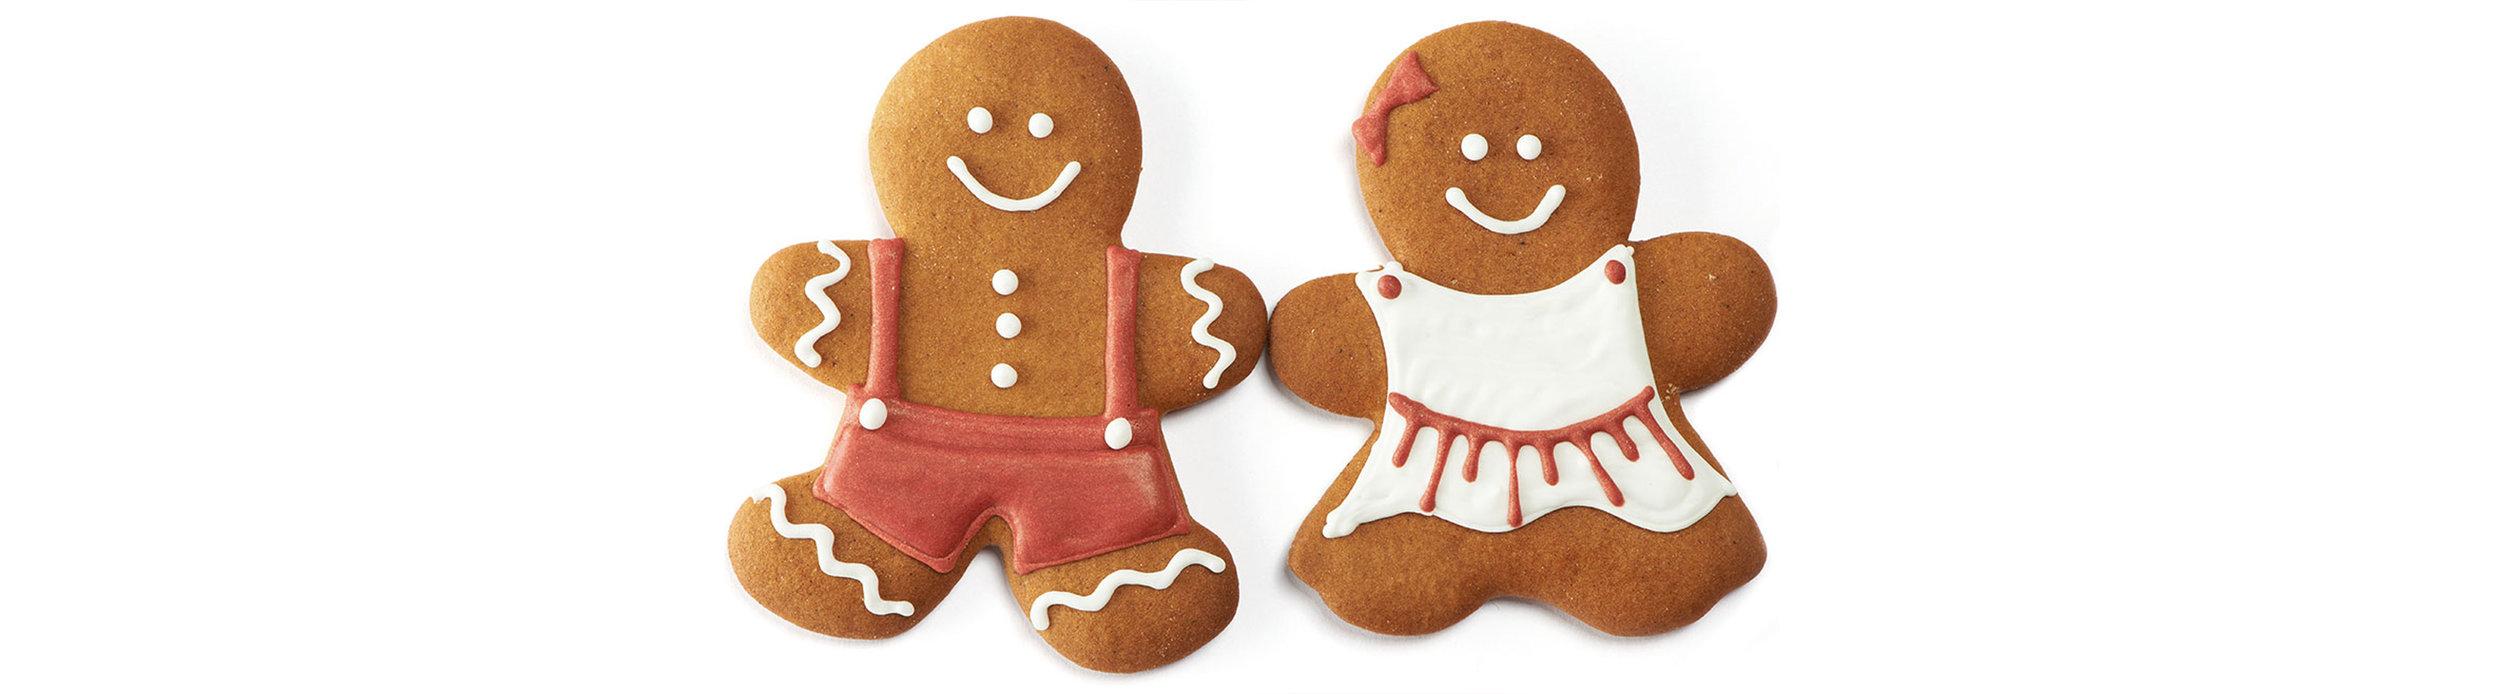 2-gingerbread.jpg